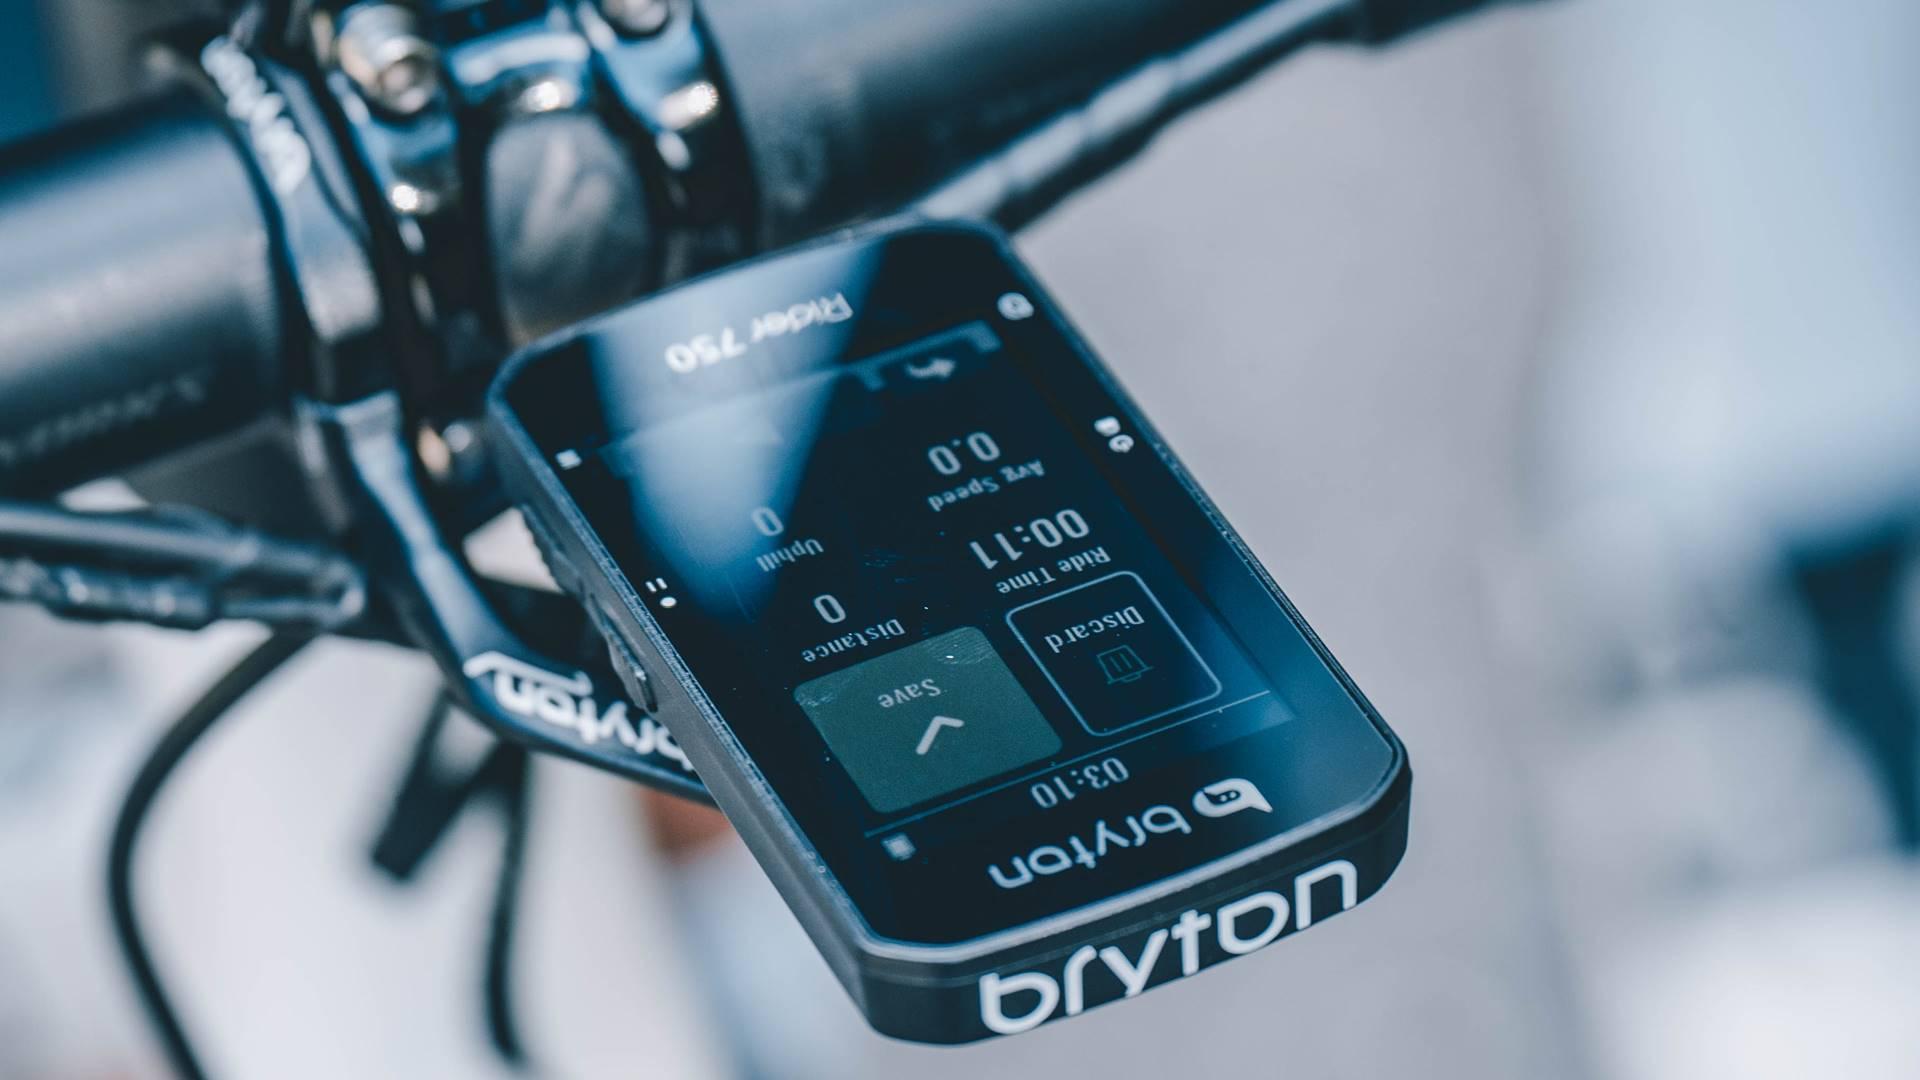 Bryton Rider 750 - innovatívan sokoldalú-2